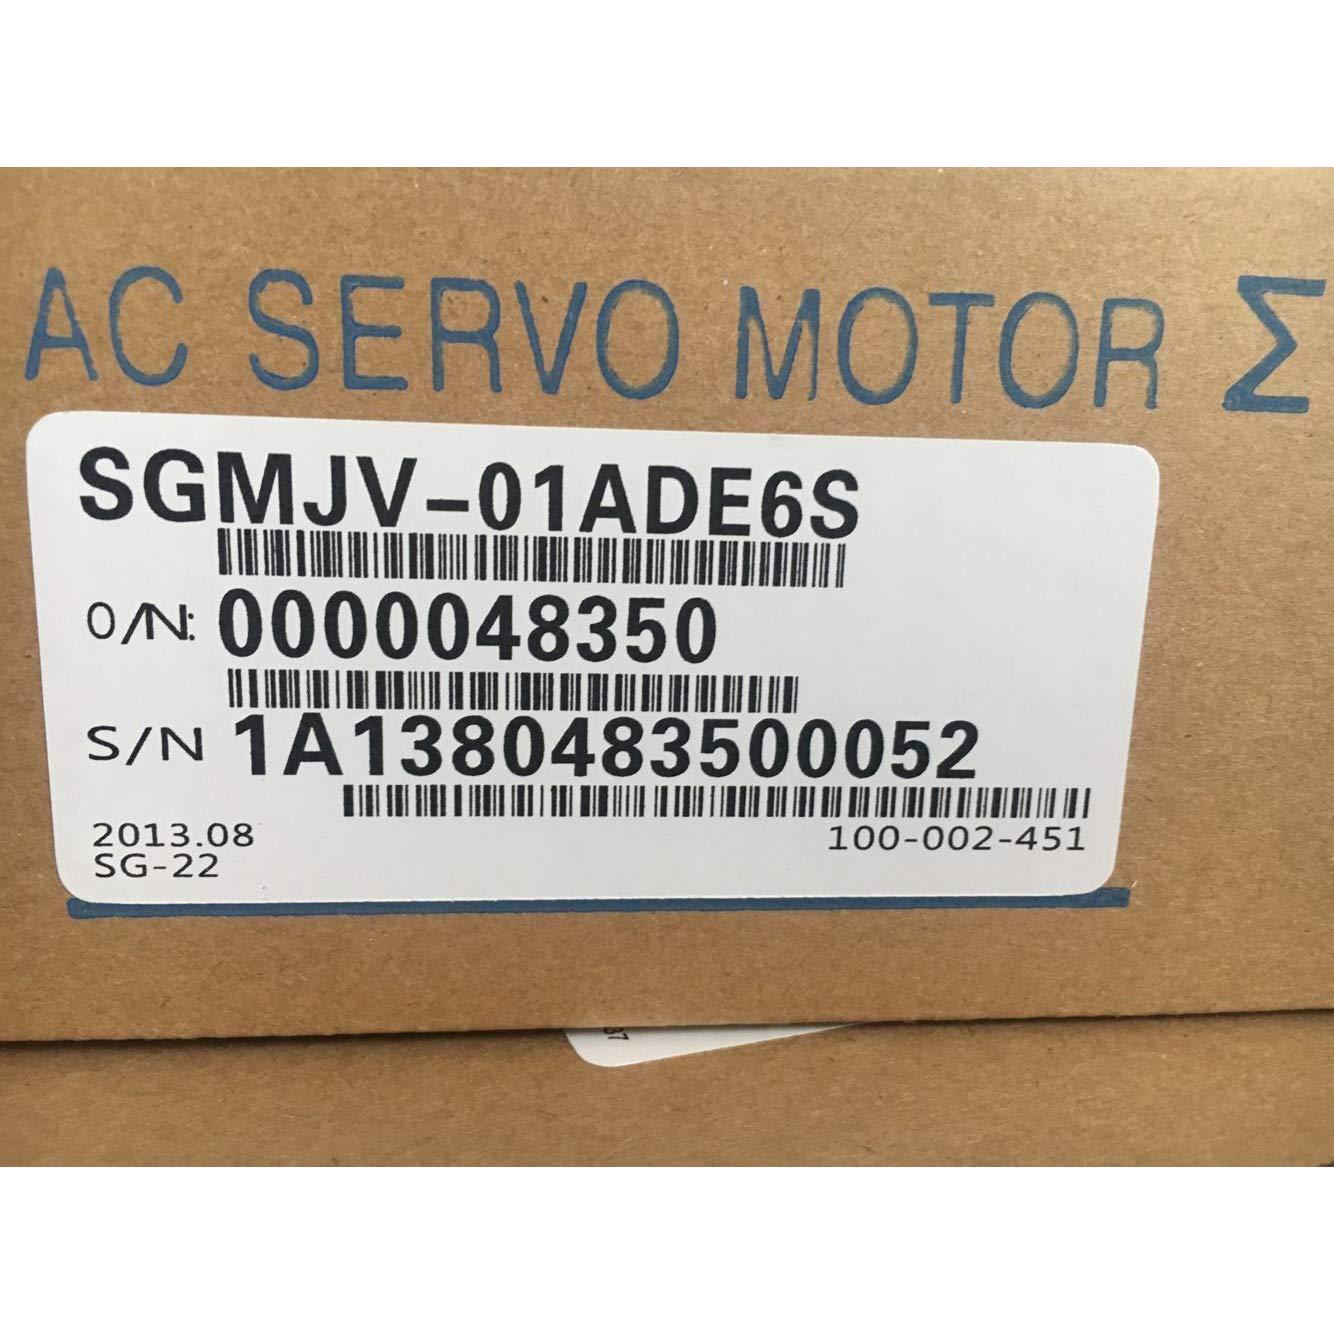 Sigma-5 Series Servo Motor SGMJV-01ADE6S 100W 3000r/min 0.318N.m 200VAC